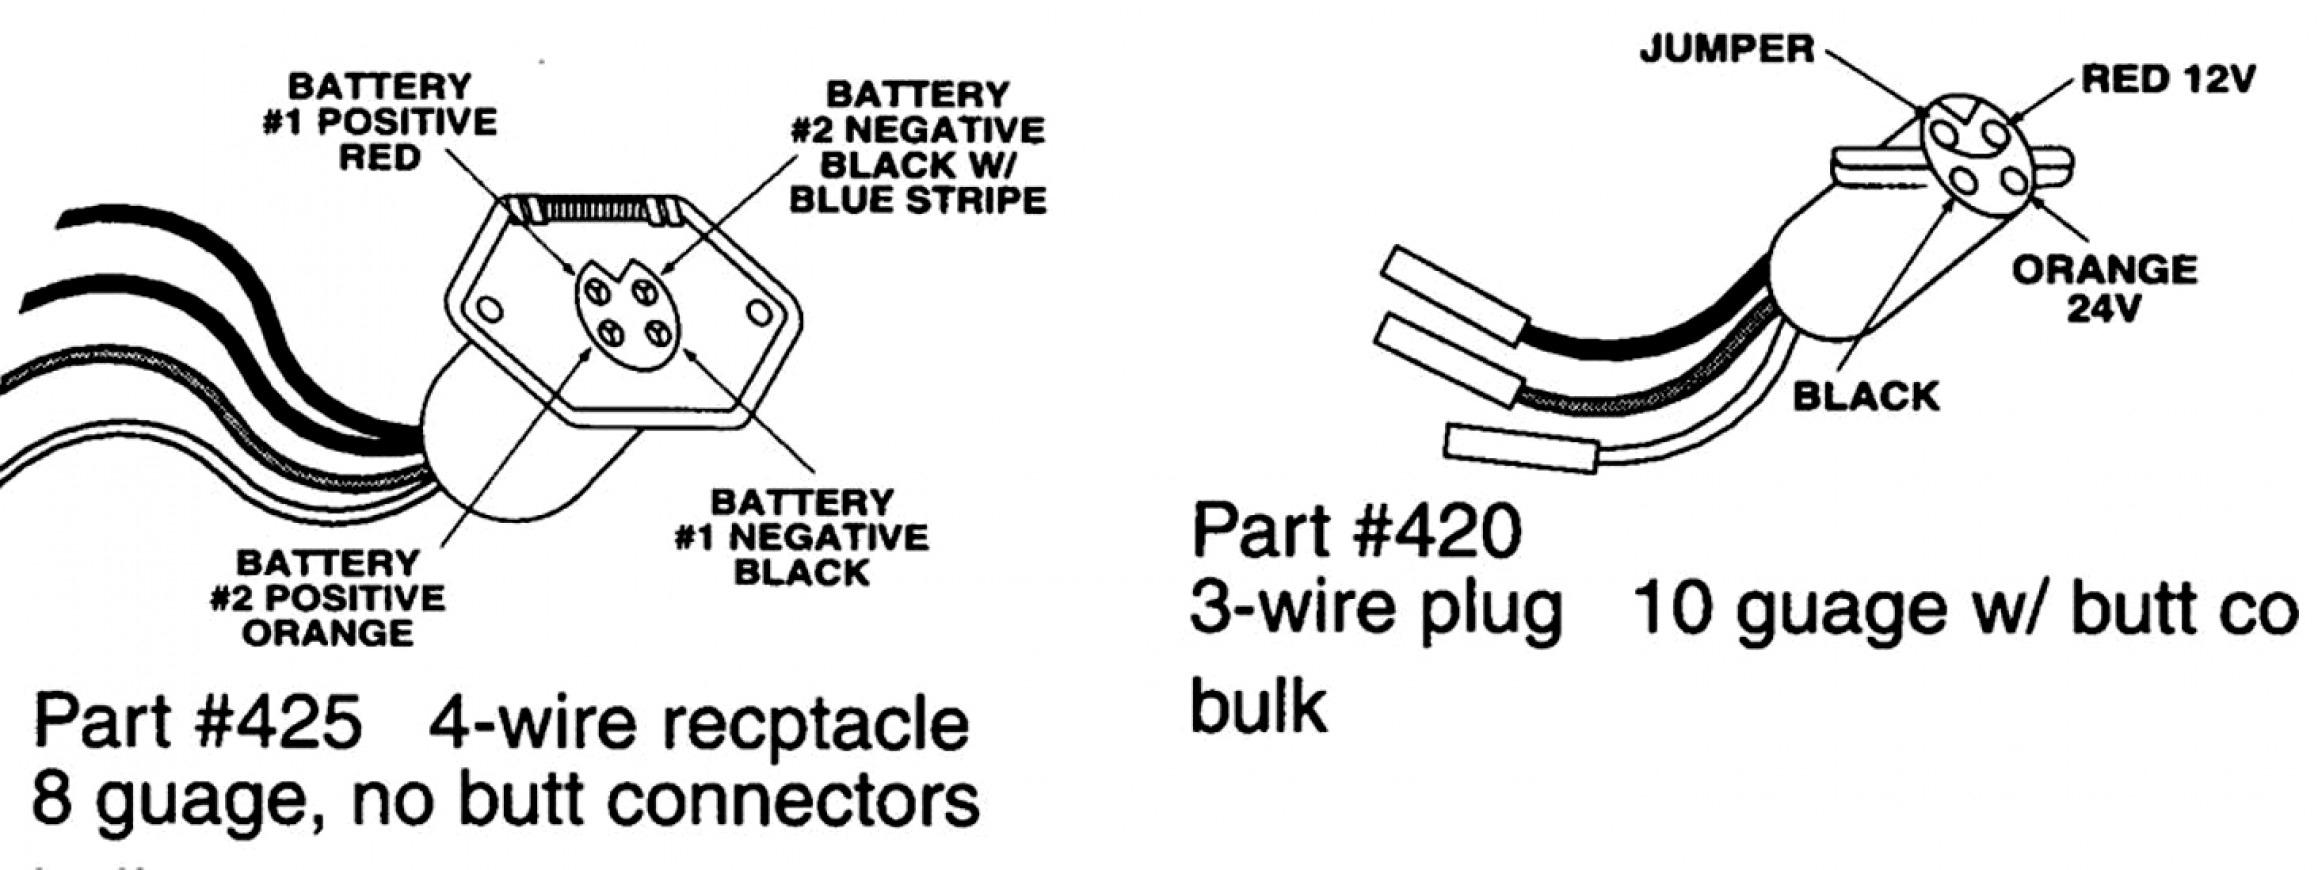 3 Wire Trolling Motor Wiring Diagram - Data Wiring Diagram Site - 24 Volt Trolling Motor Wiring Diagram